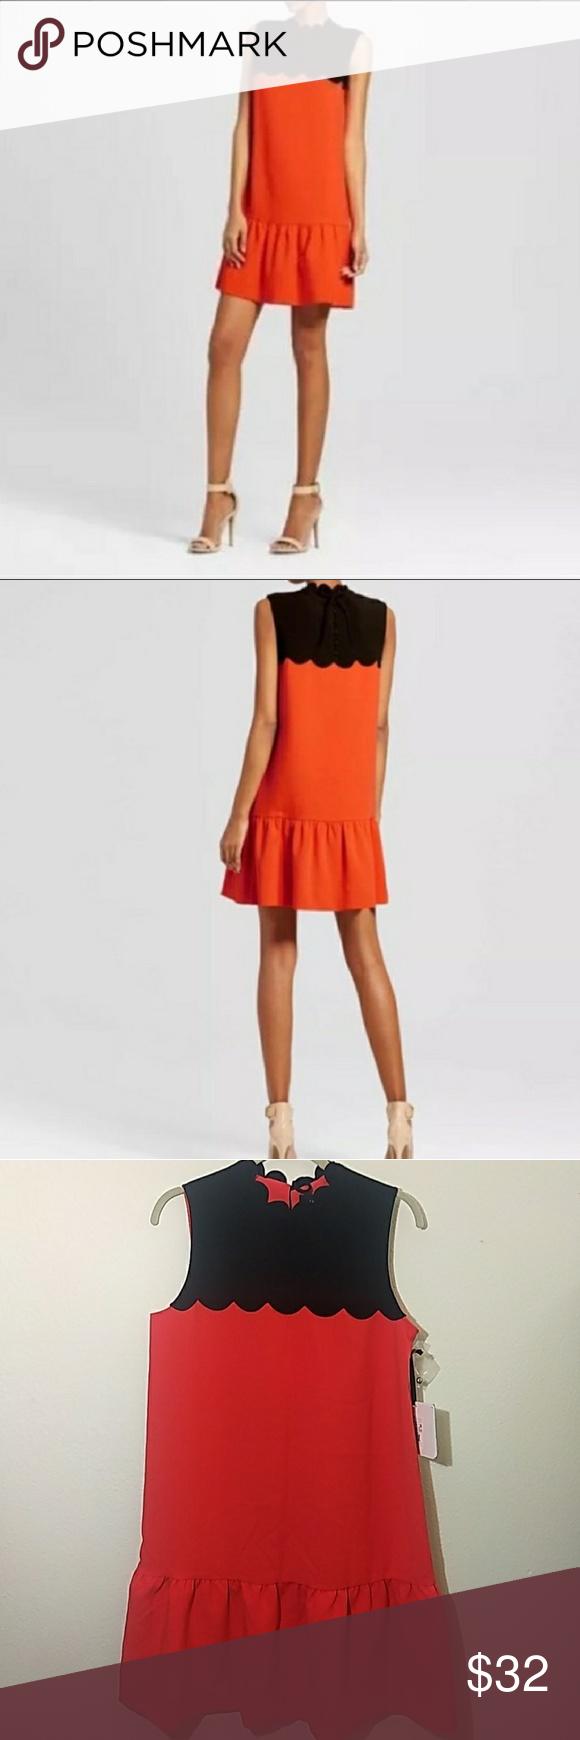 Victoria Beckham For Target Nwt Orange Dress Girly Dresses Orange Dress Victoria Beckham Target [ 1740 x 580 Pixel ]